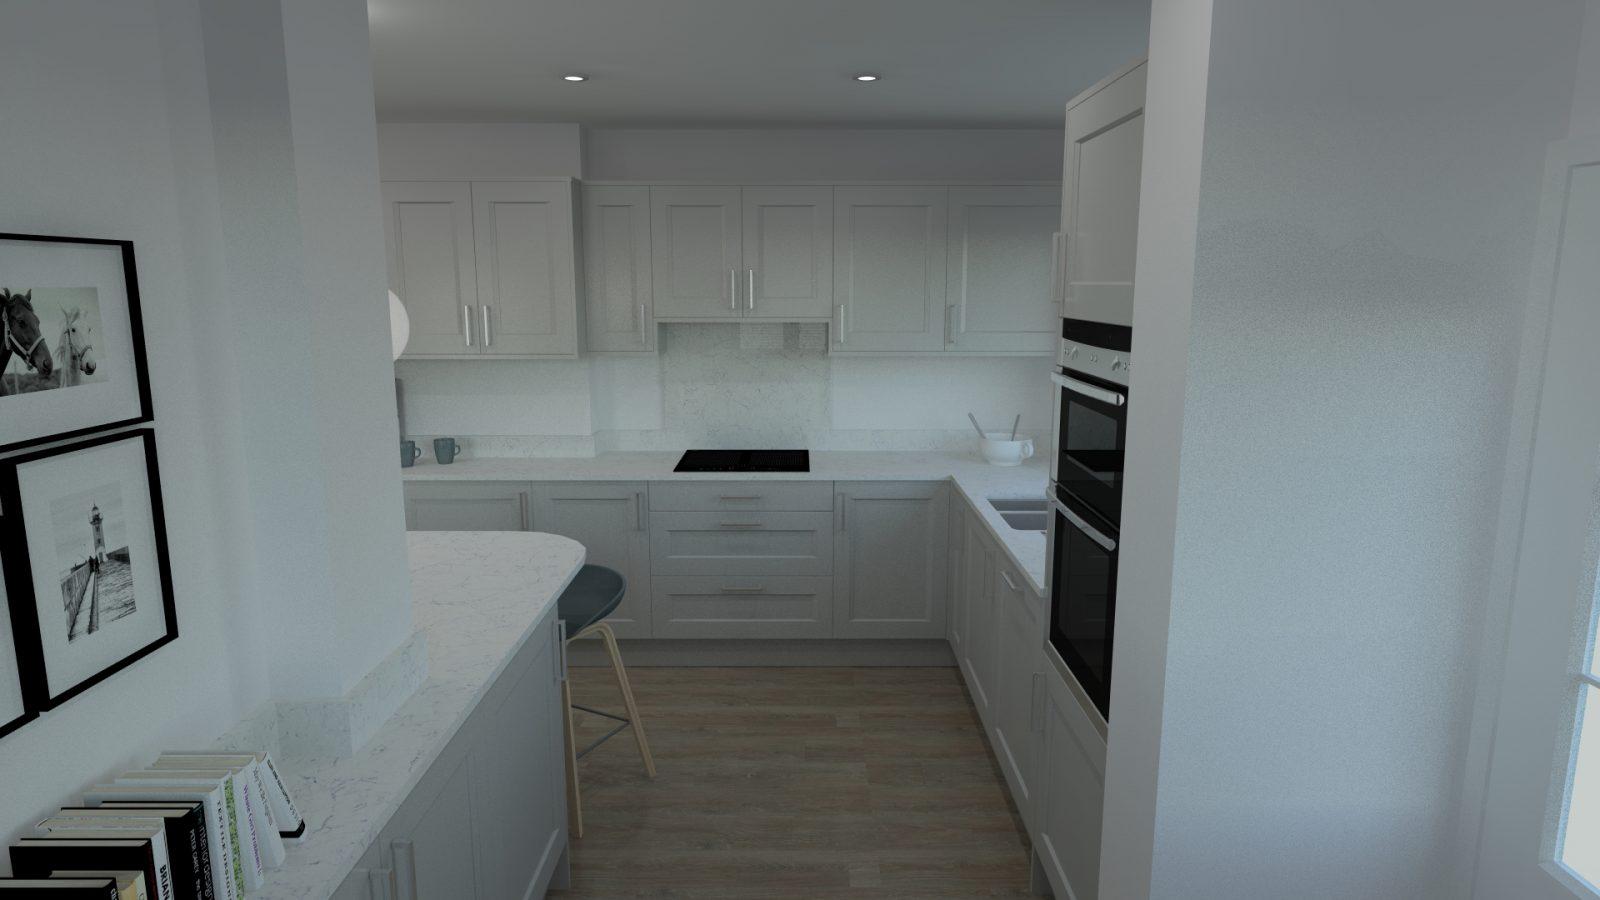 Freelance kitchen design expertise